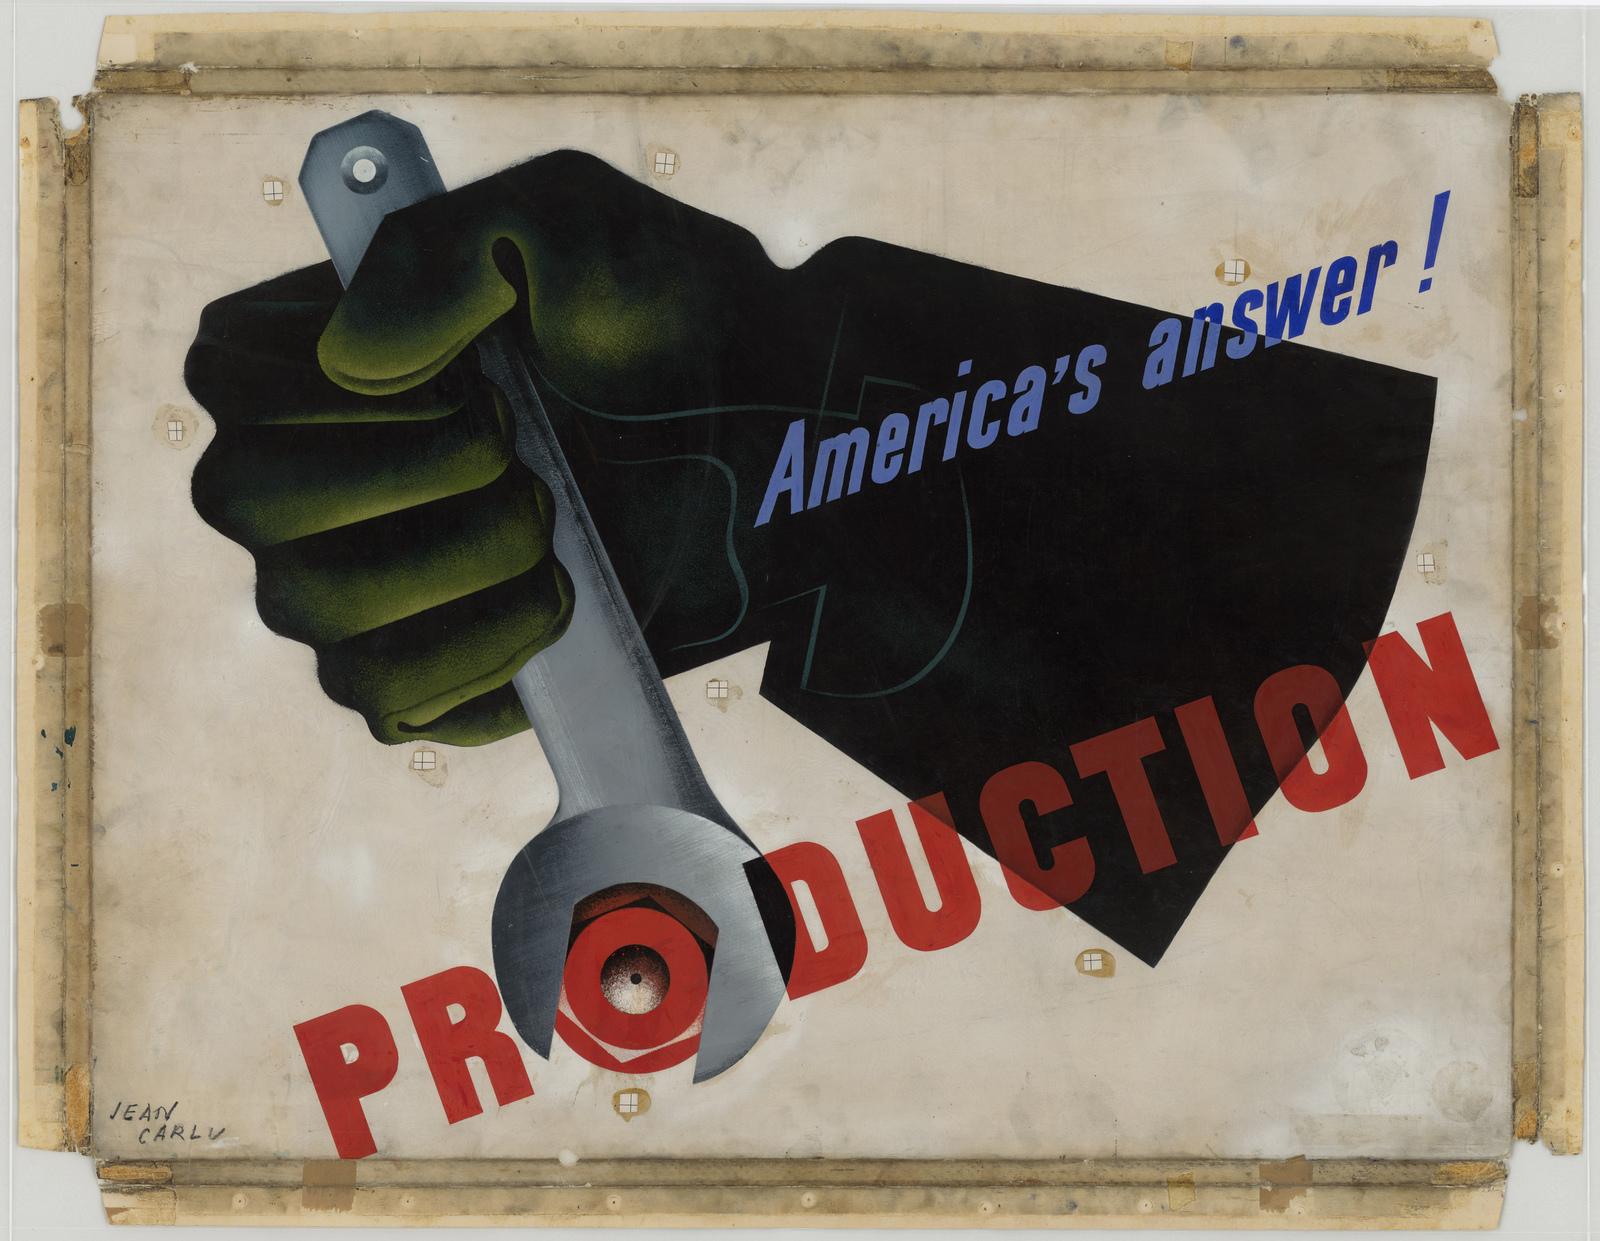 America's answer!  PRODUCTION [Jean Carlu]